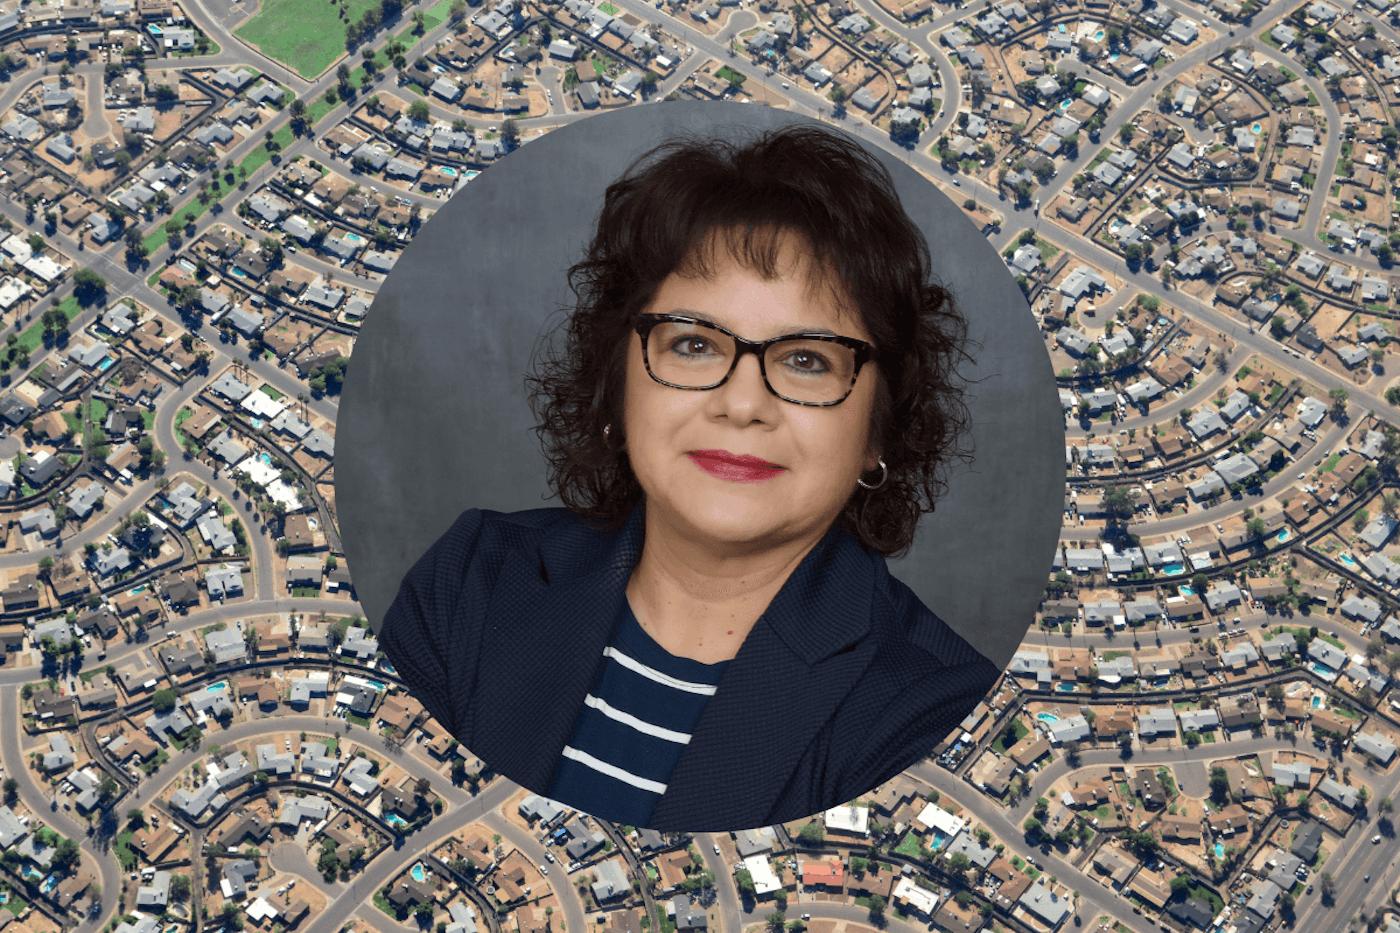 headshot of Patricia Garcia Duarte superimposed over an aerial view of a Phoenix neighborhood